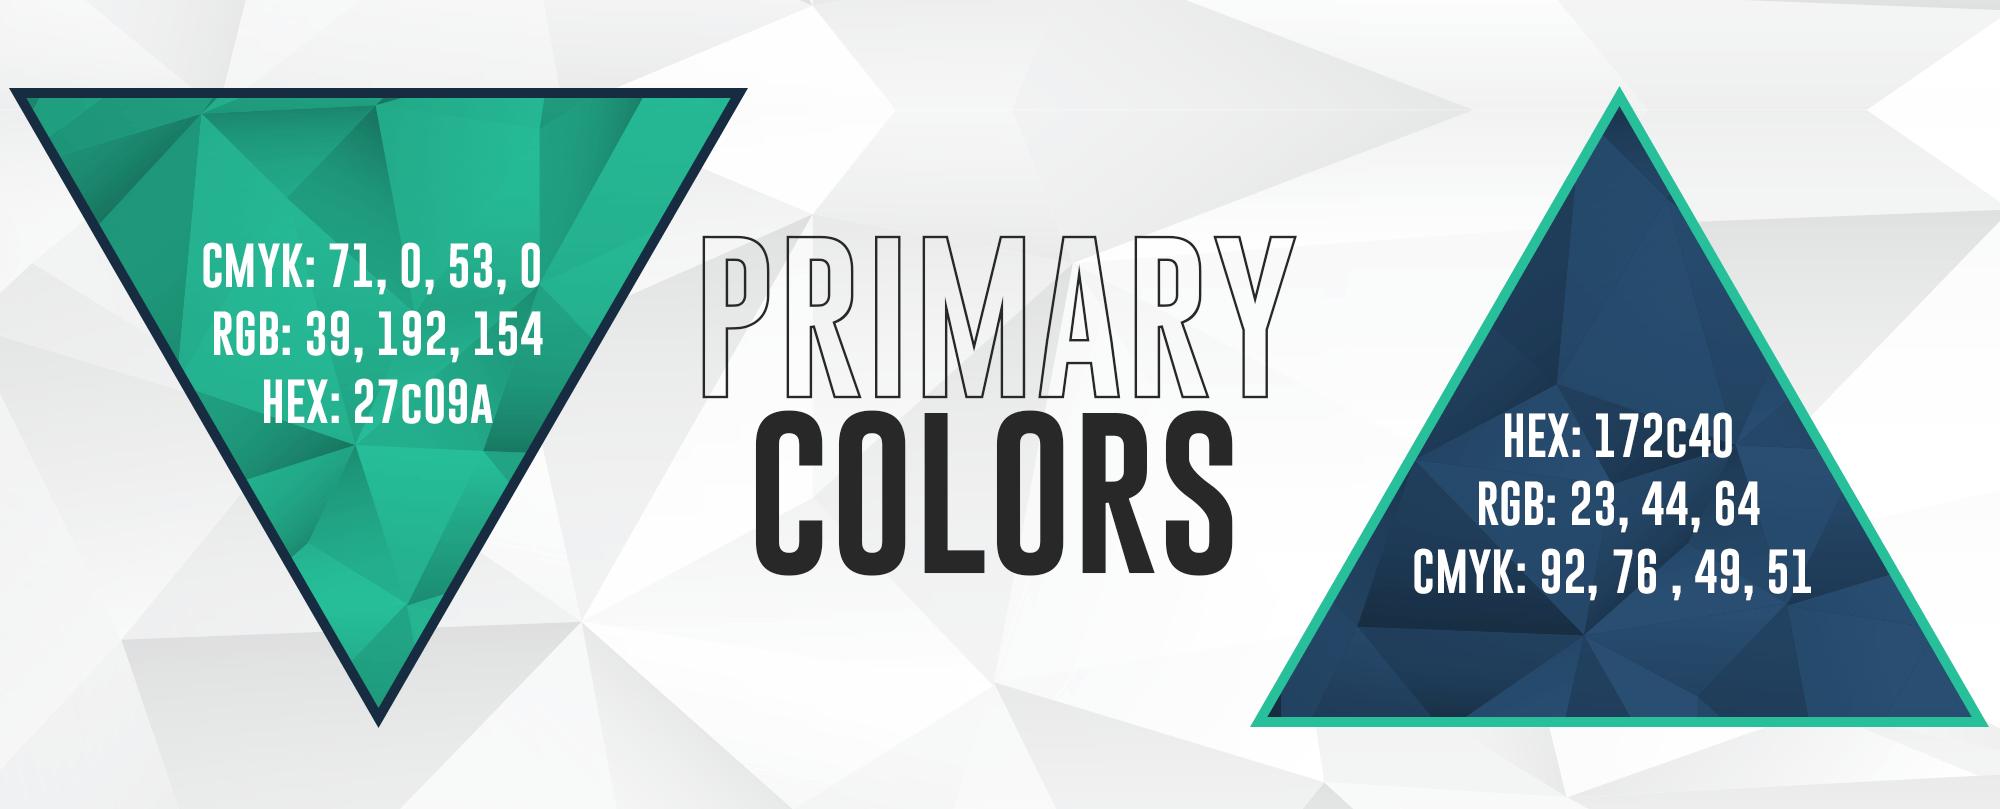 Primary Colors - Rosen Markov